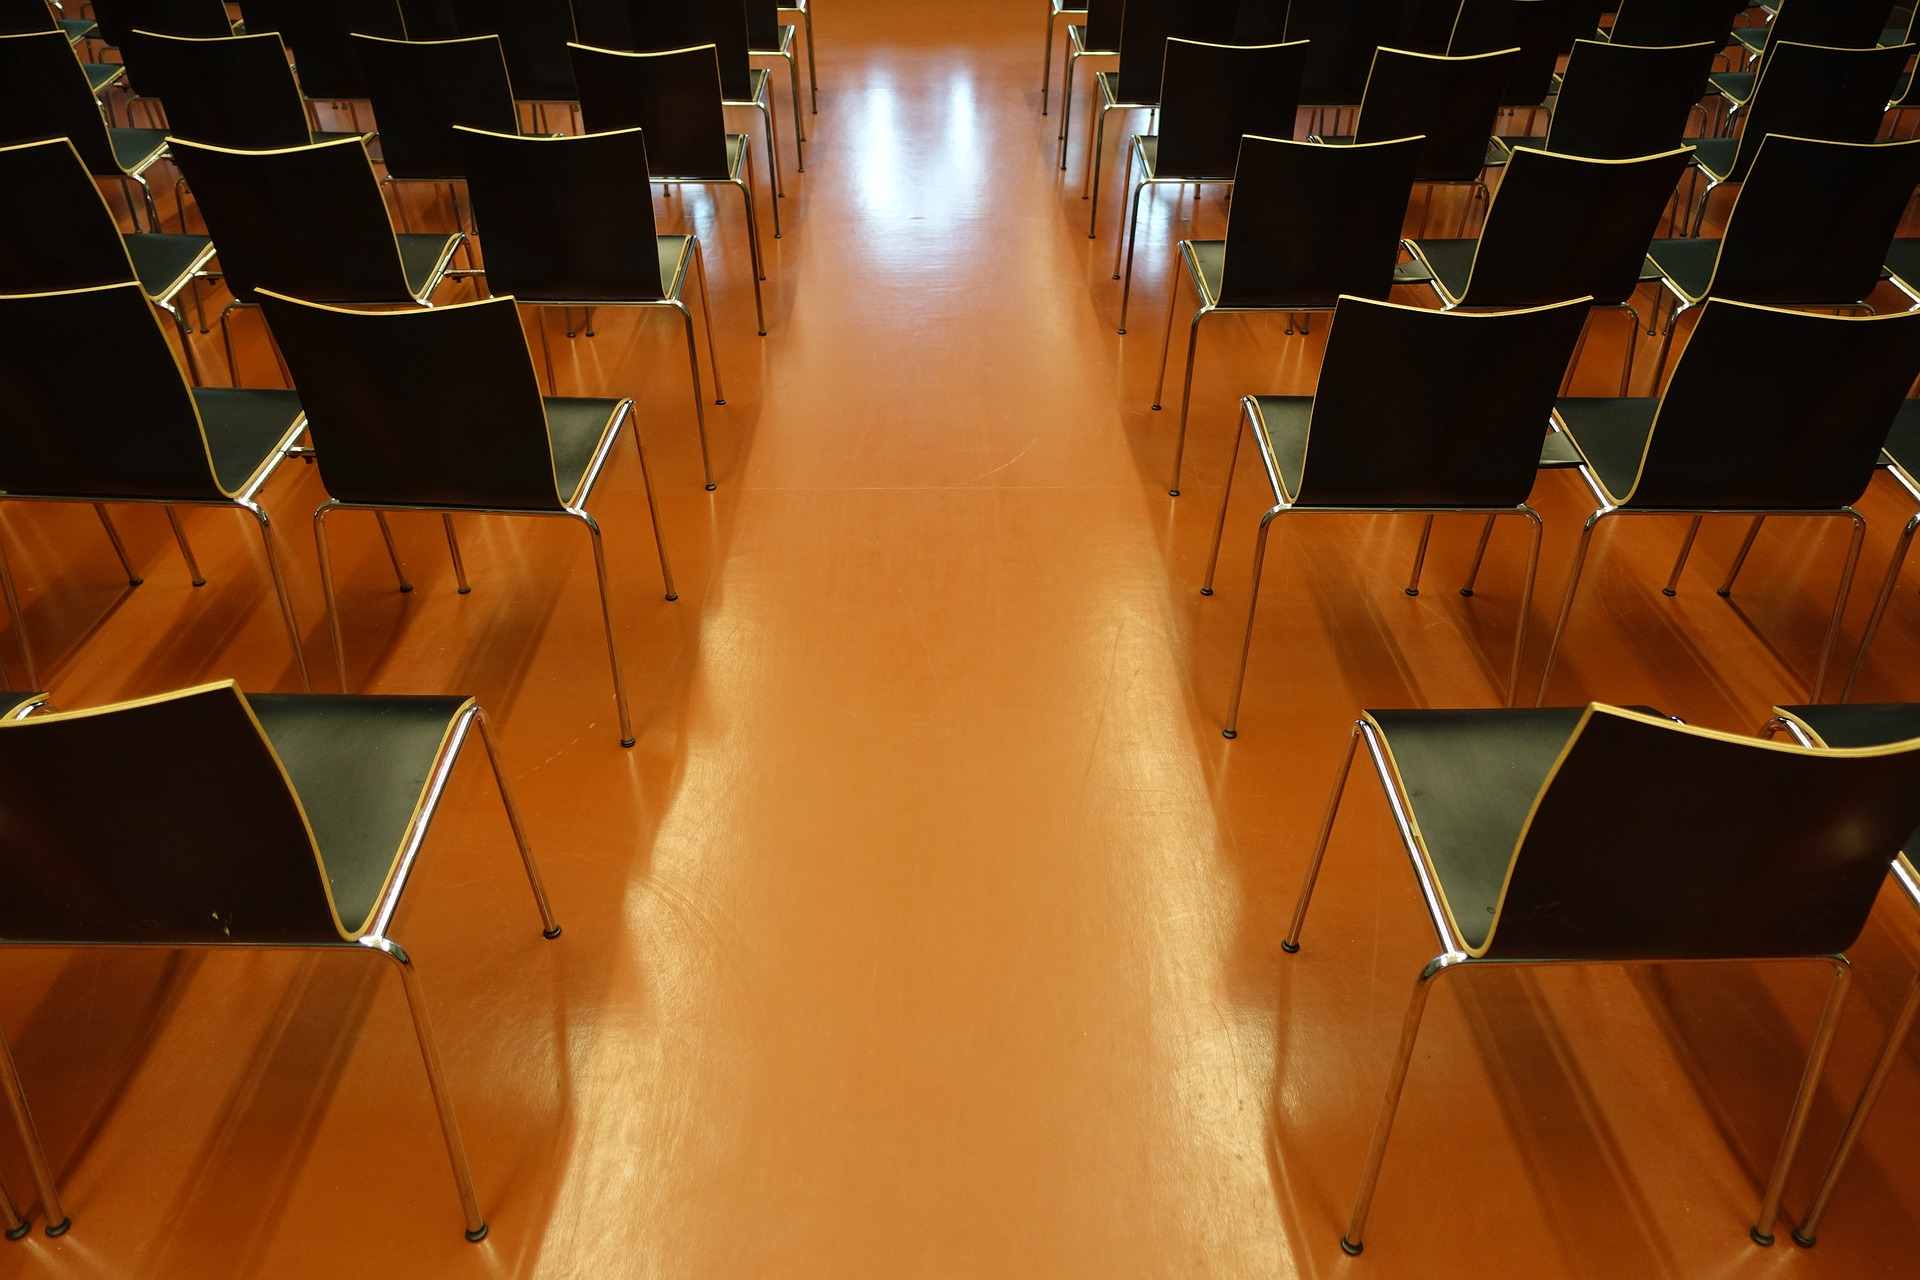 foto di un auditorium